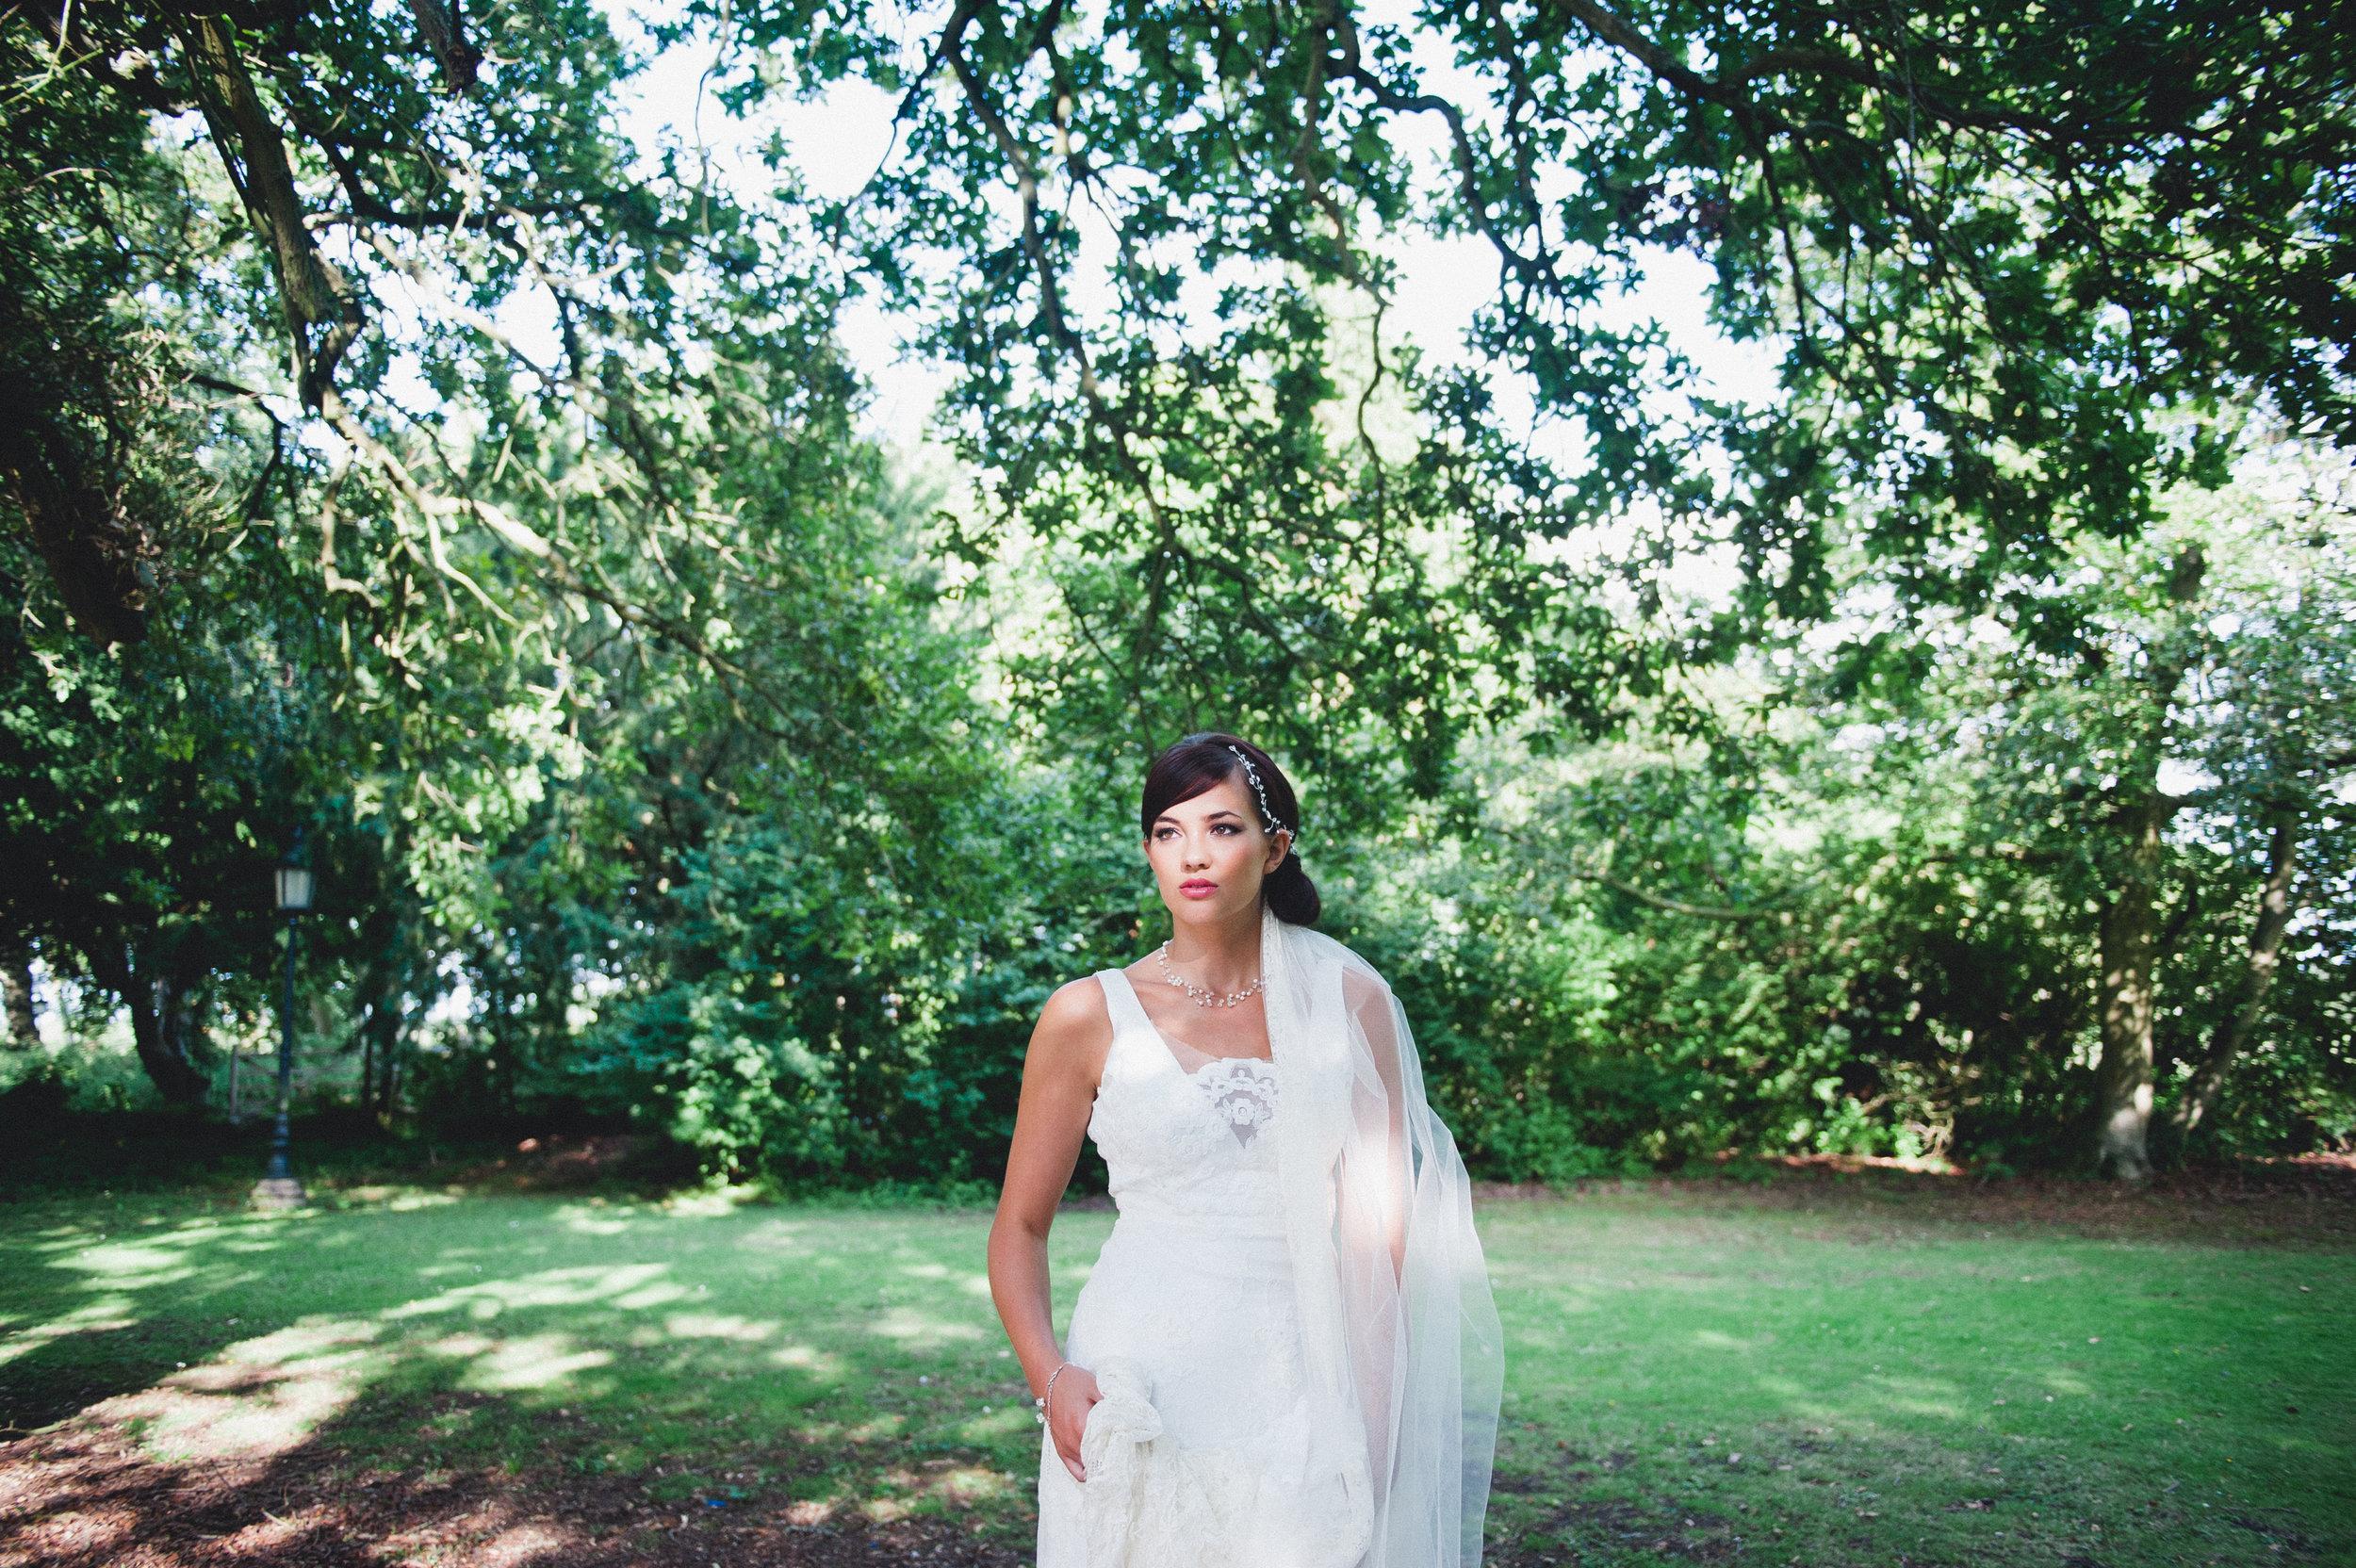 Italian Inspiration - Whimsical Wedding Wonderland